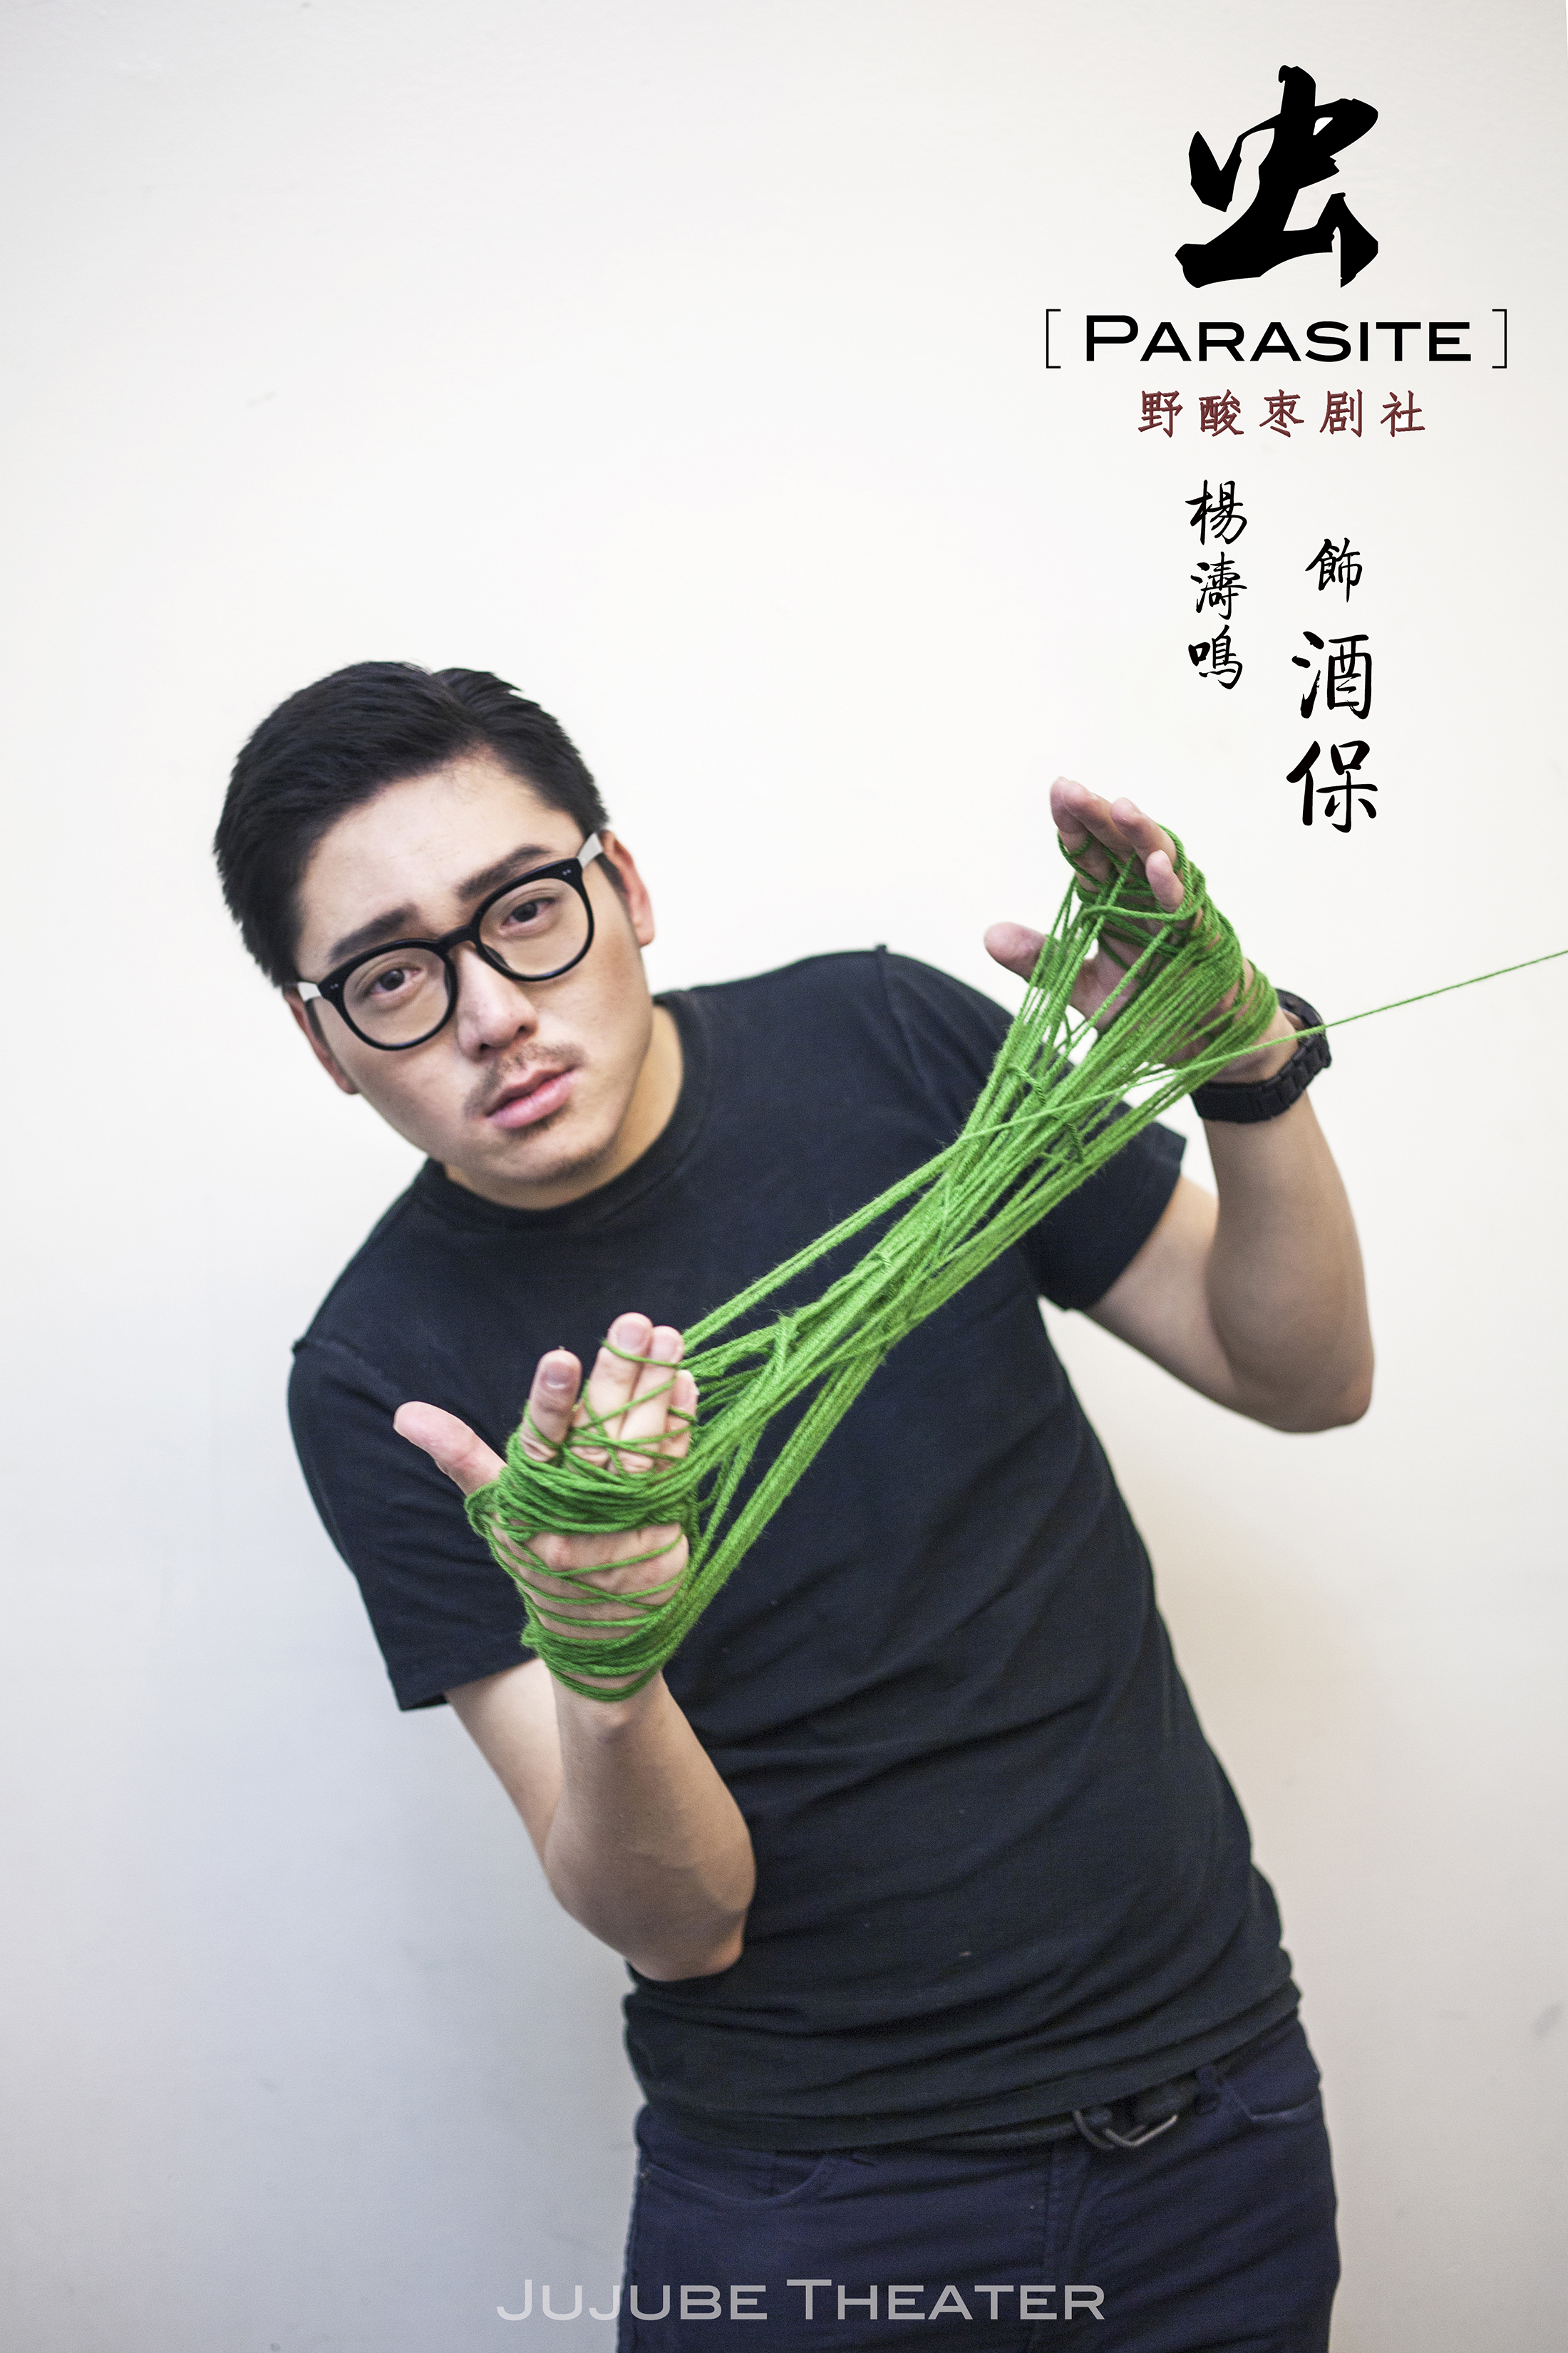 'Parasite' Cast Poster